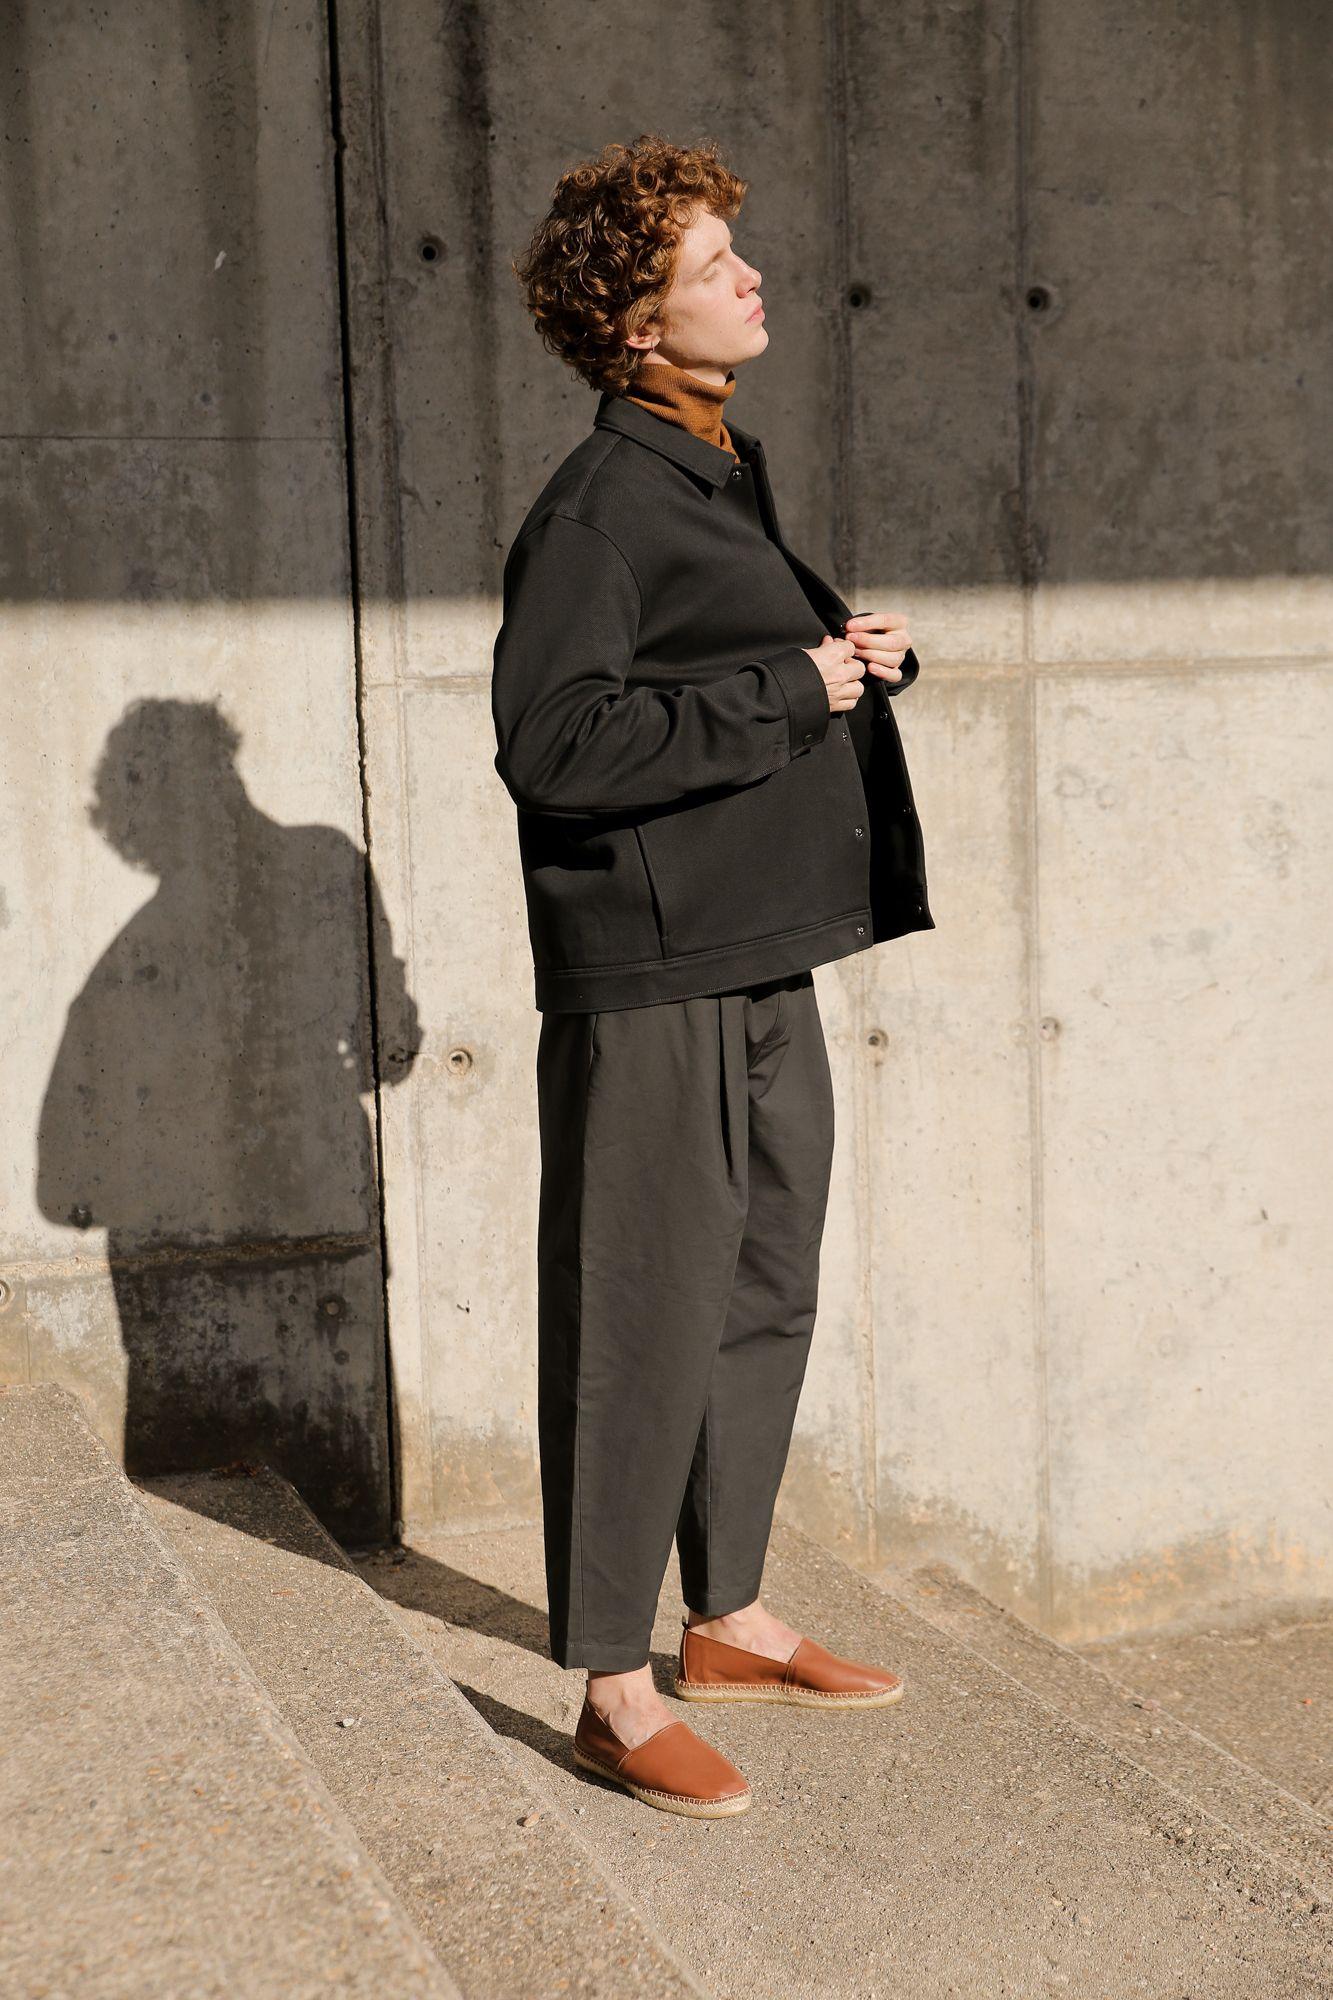 giay mua he - elle man style calendar - espadrille - urban men outfits